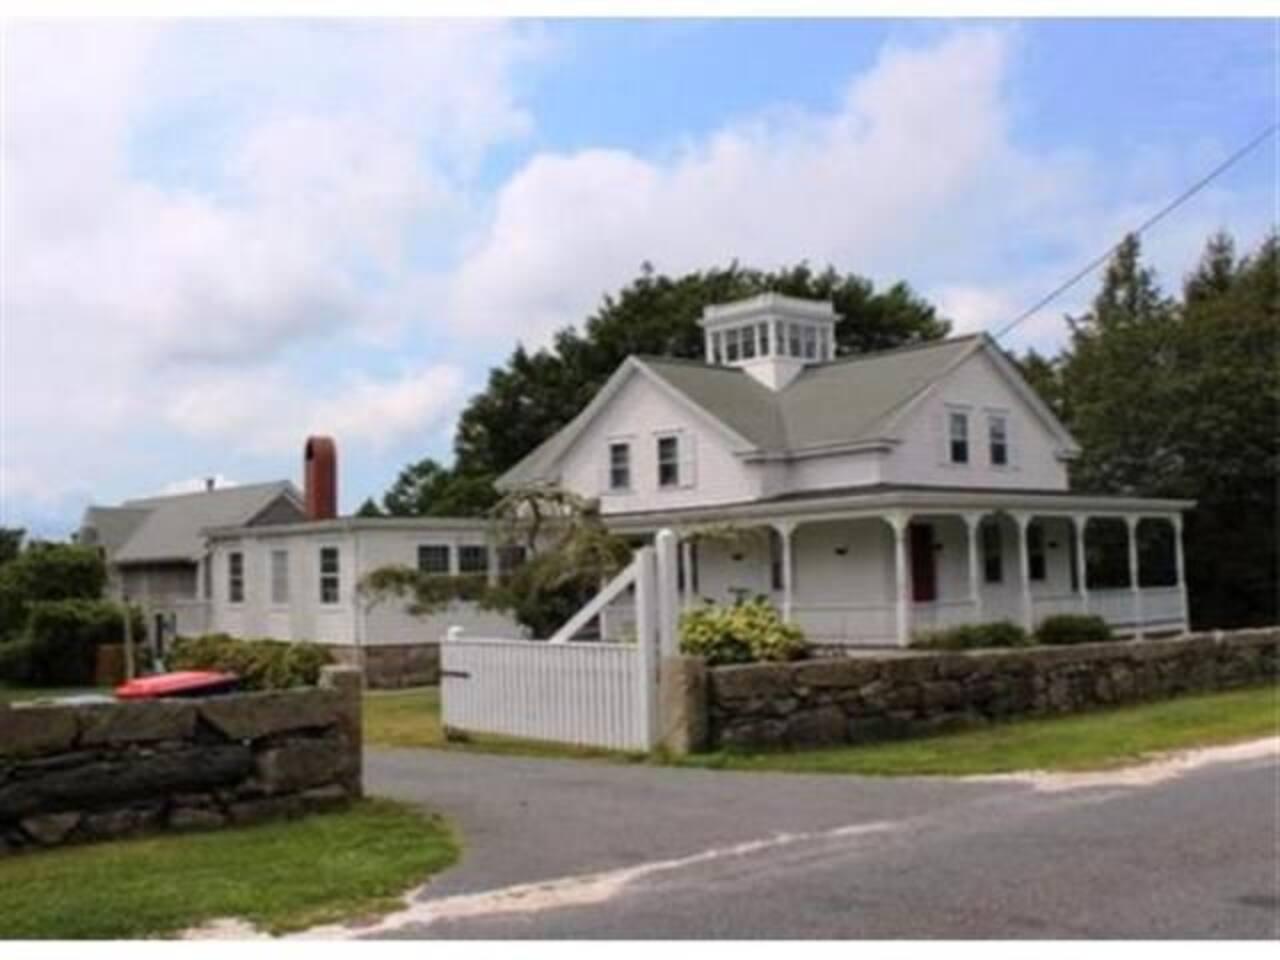 1880 Victorian Farmhouse